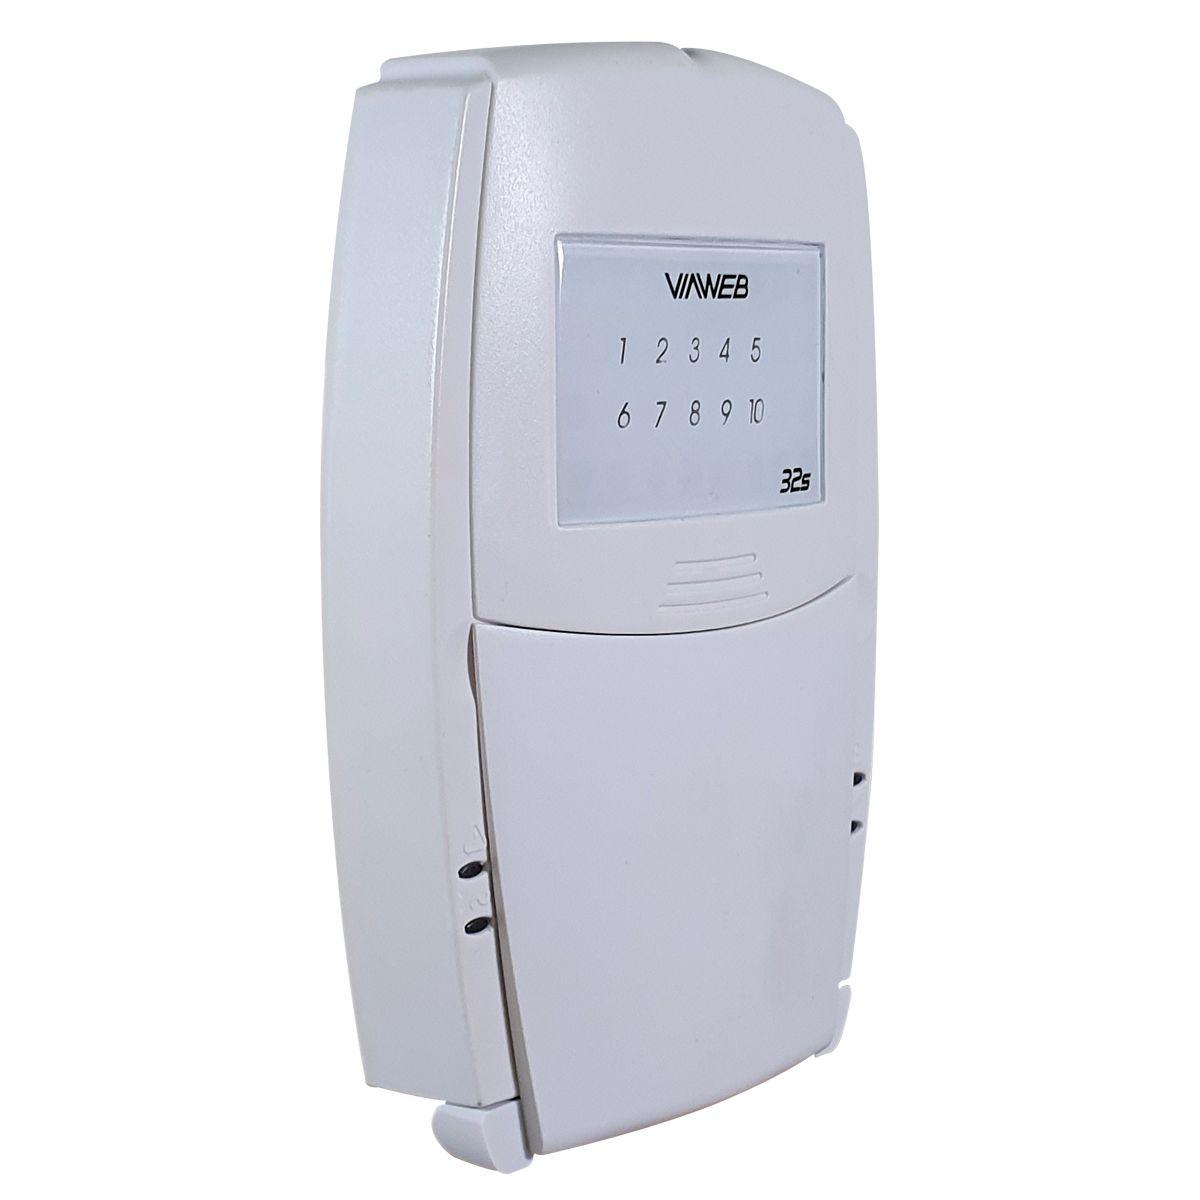 Teclado 32S para Centrais de Alarme Viaweb  - Tudo Forte